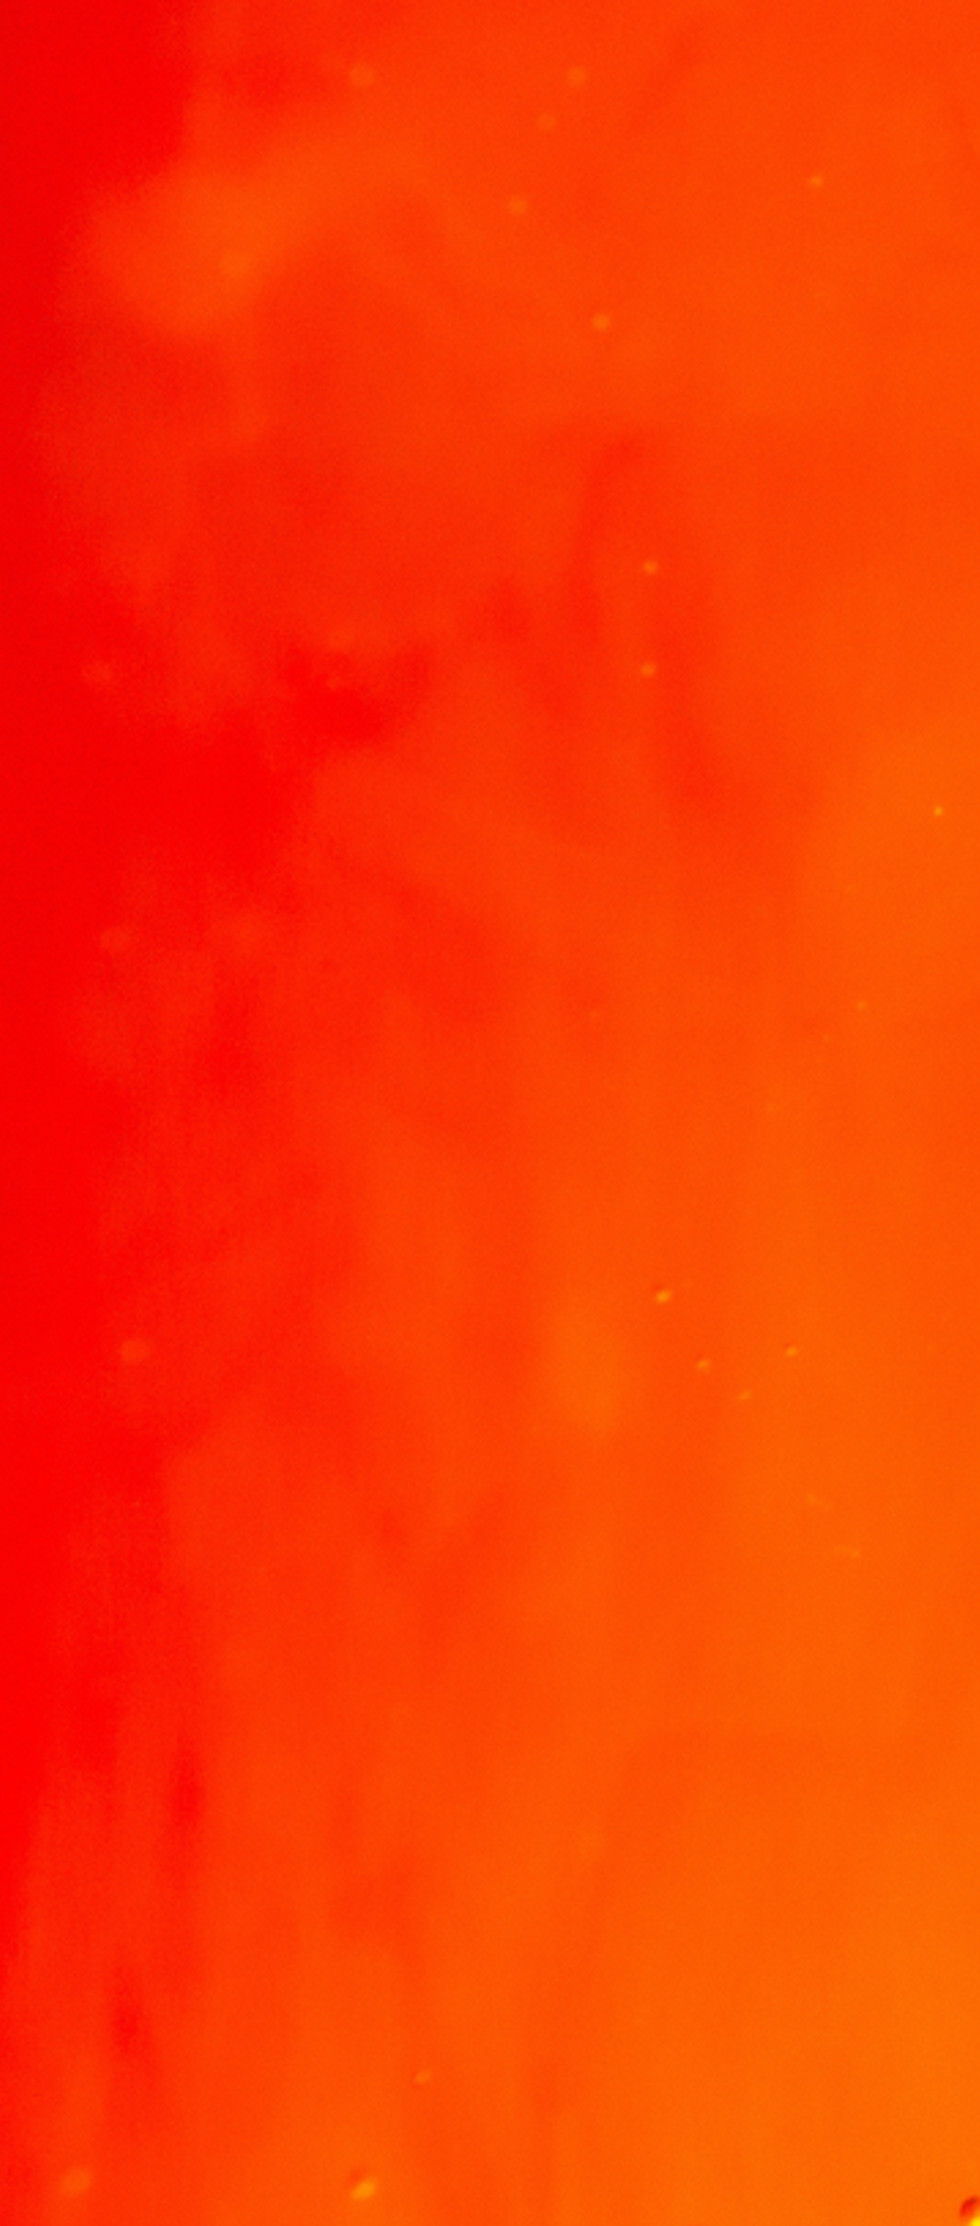 Red and Orange Gradient